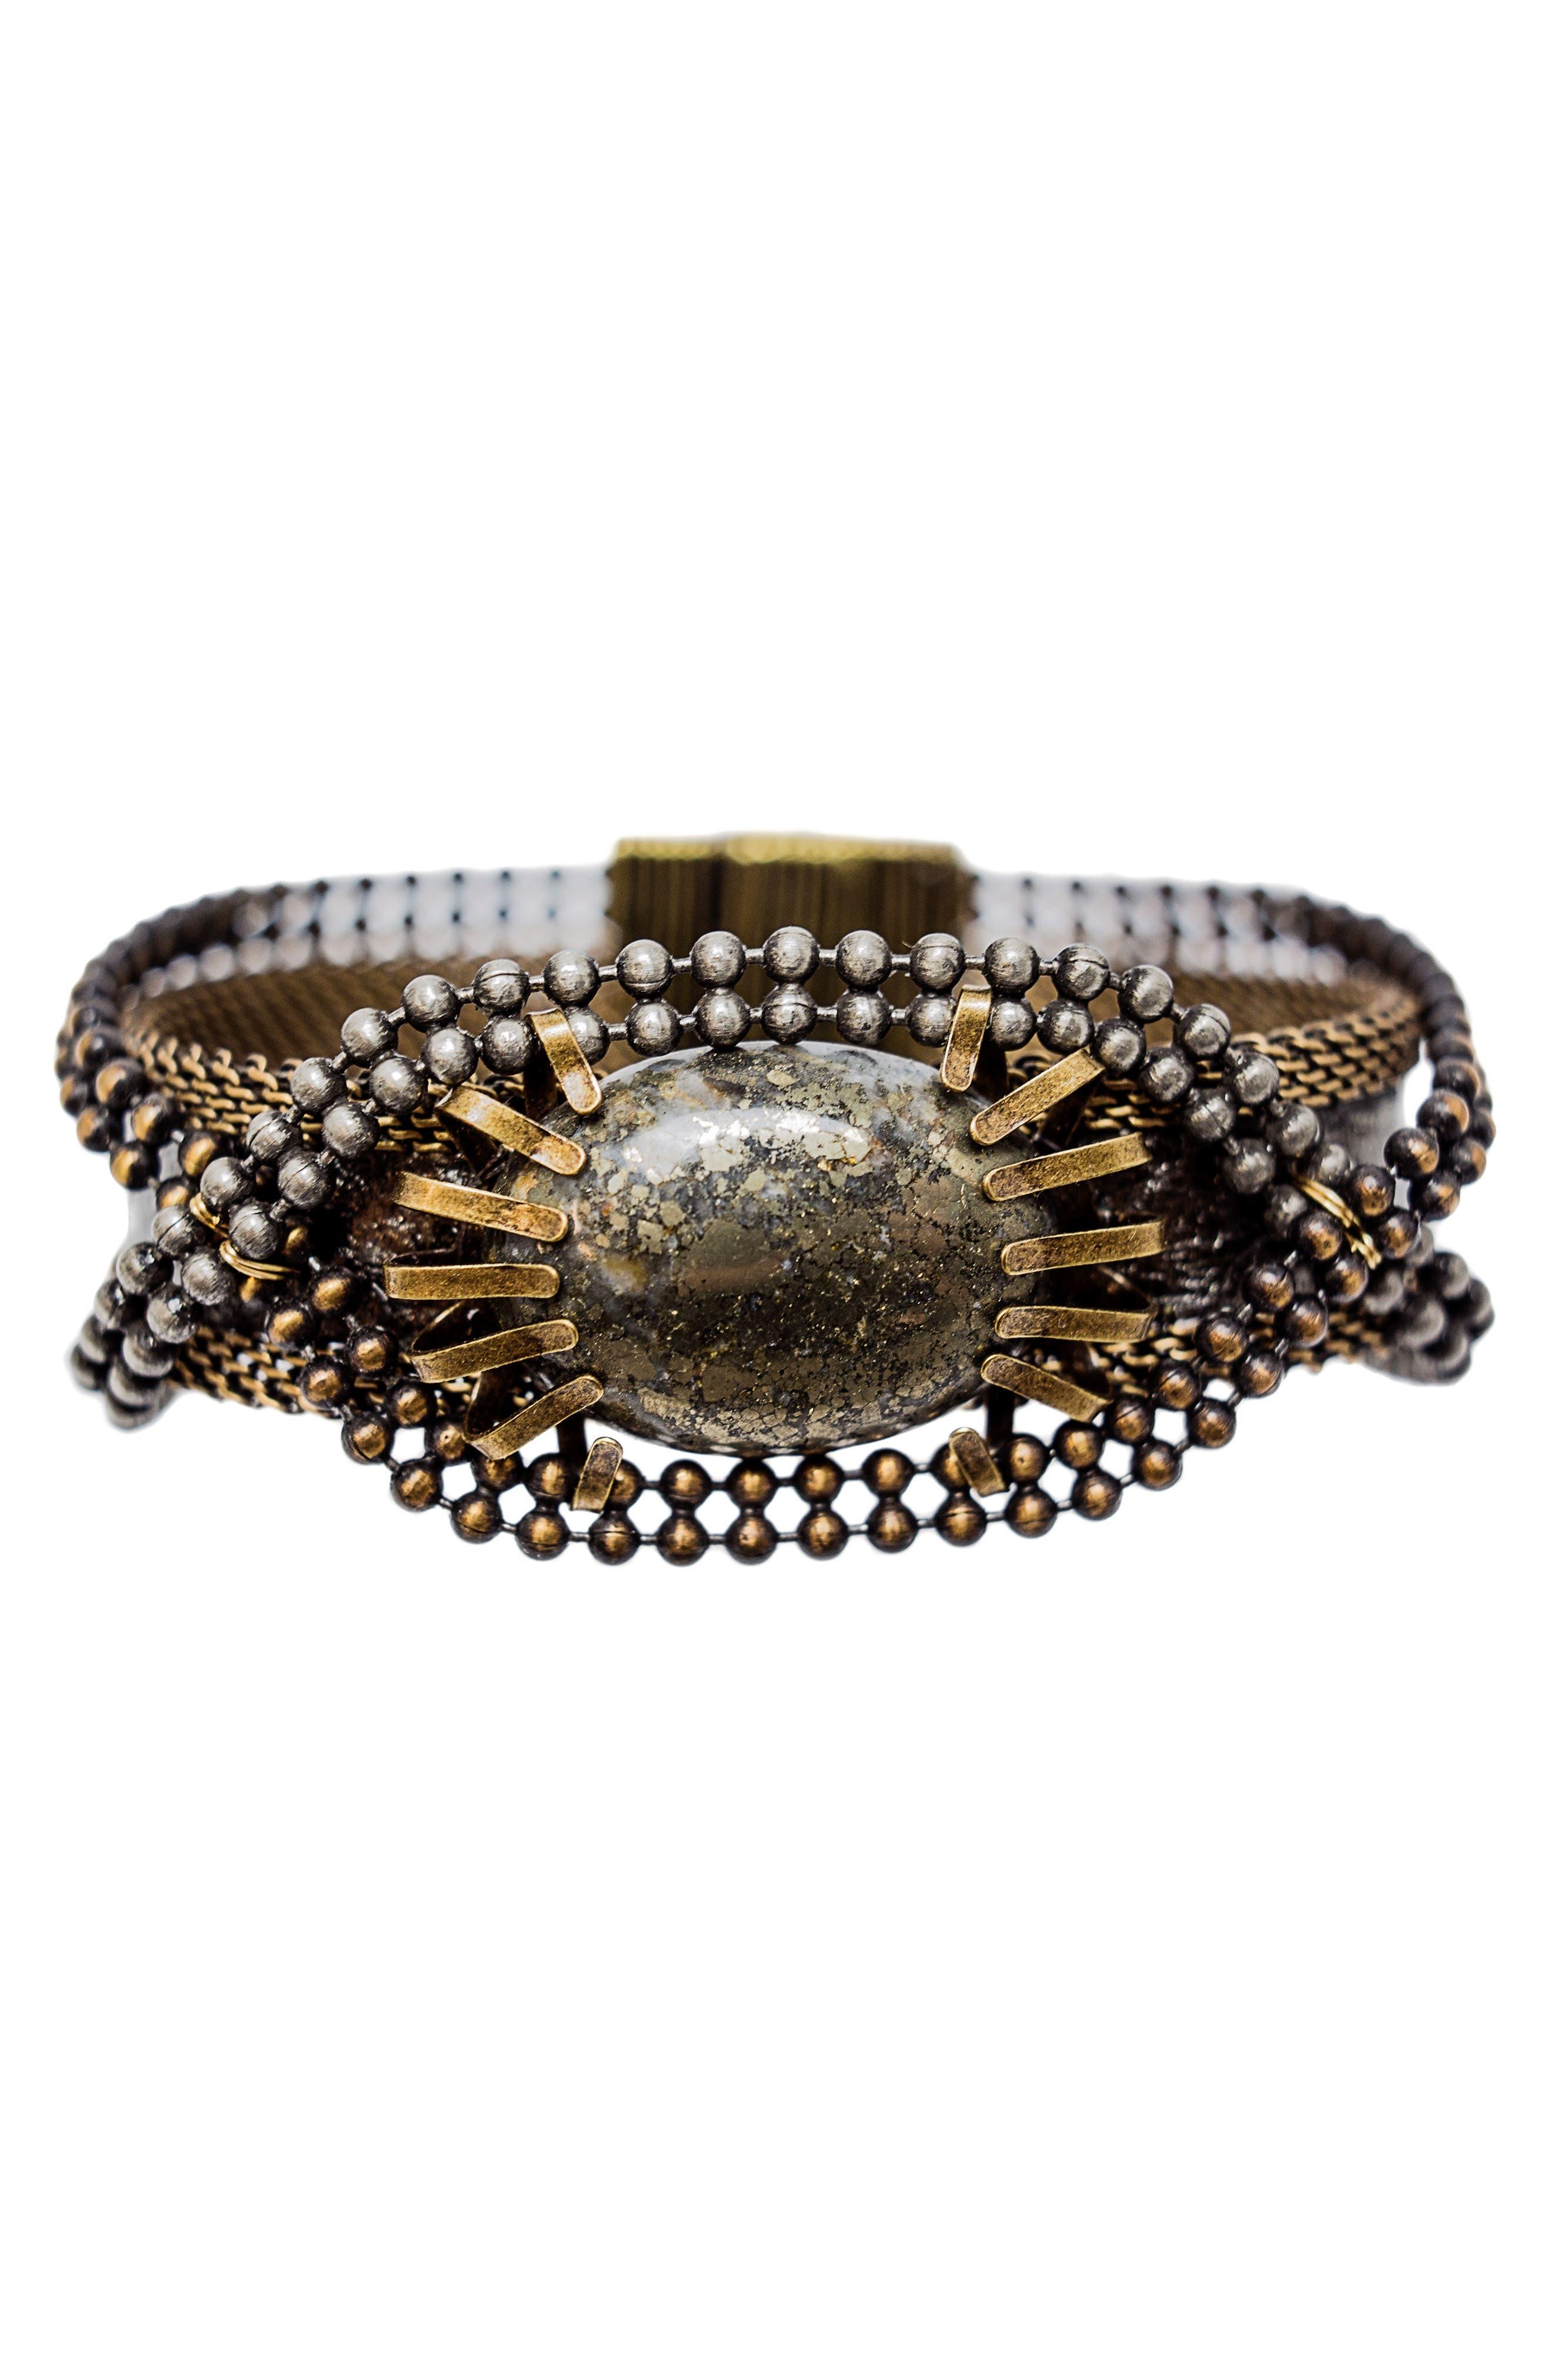 Stone & Snakeskin Bracelet,                             Main thumbnail 1, color,                             Bronze/ Silver/ Gold